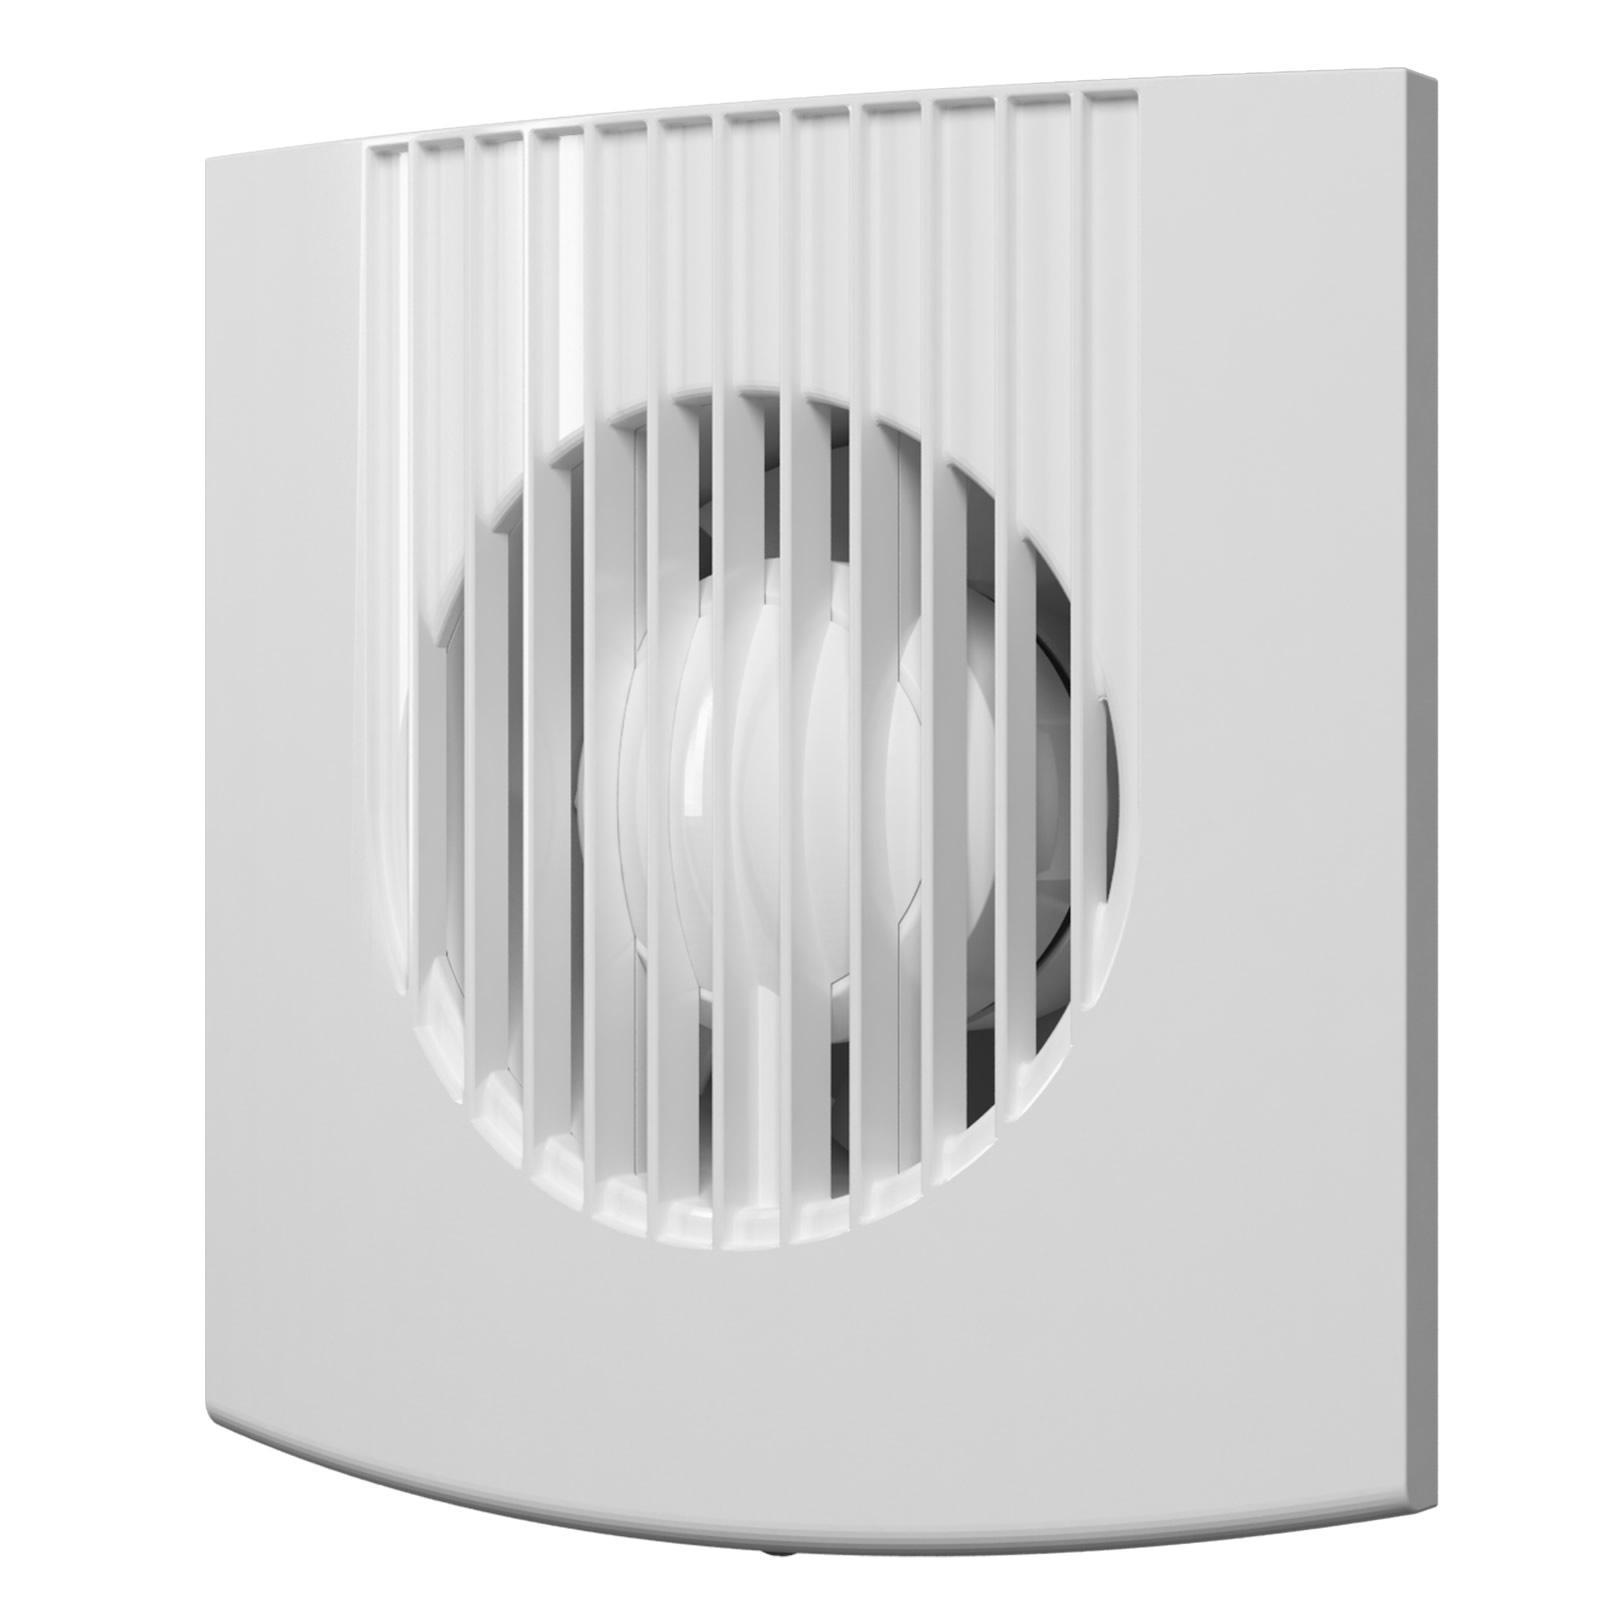 Вентилятор Era Favorite 5c